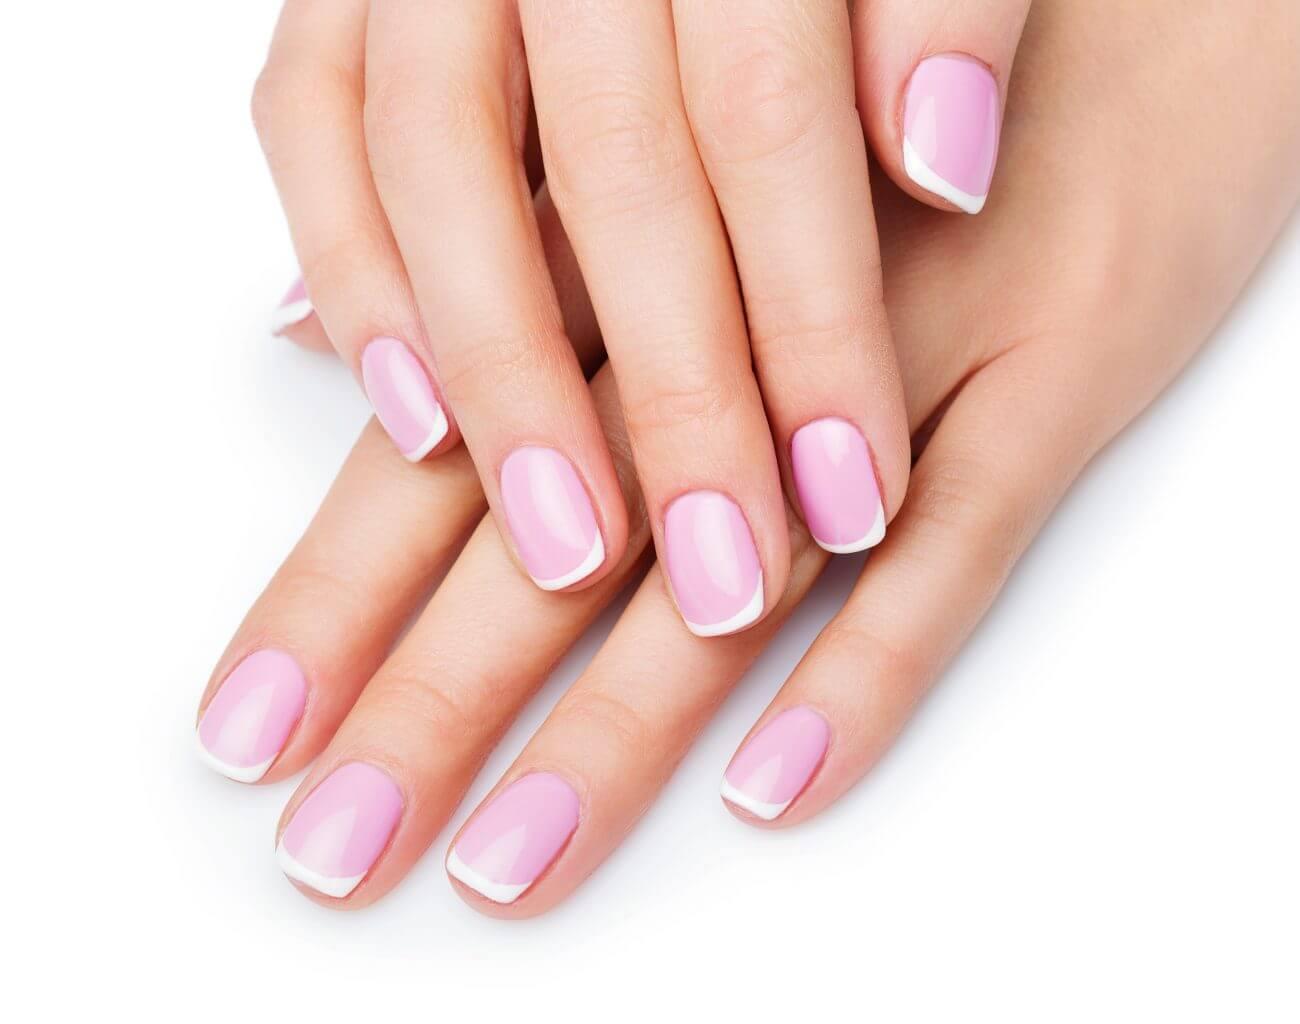 Manicure & Pedicure Omaha NE | Faces Spa